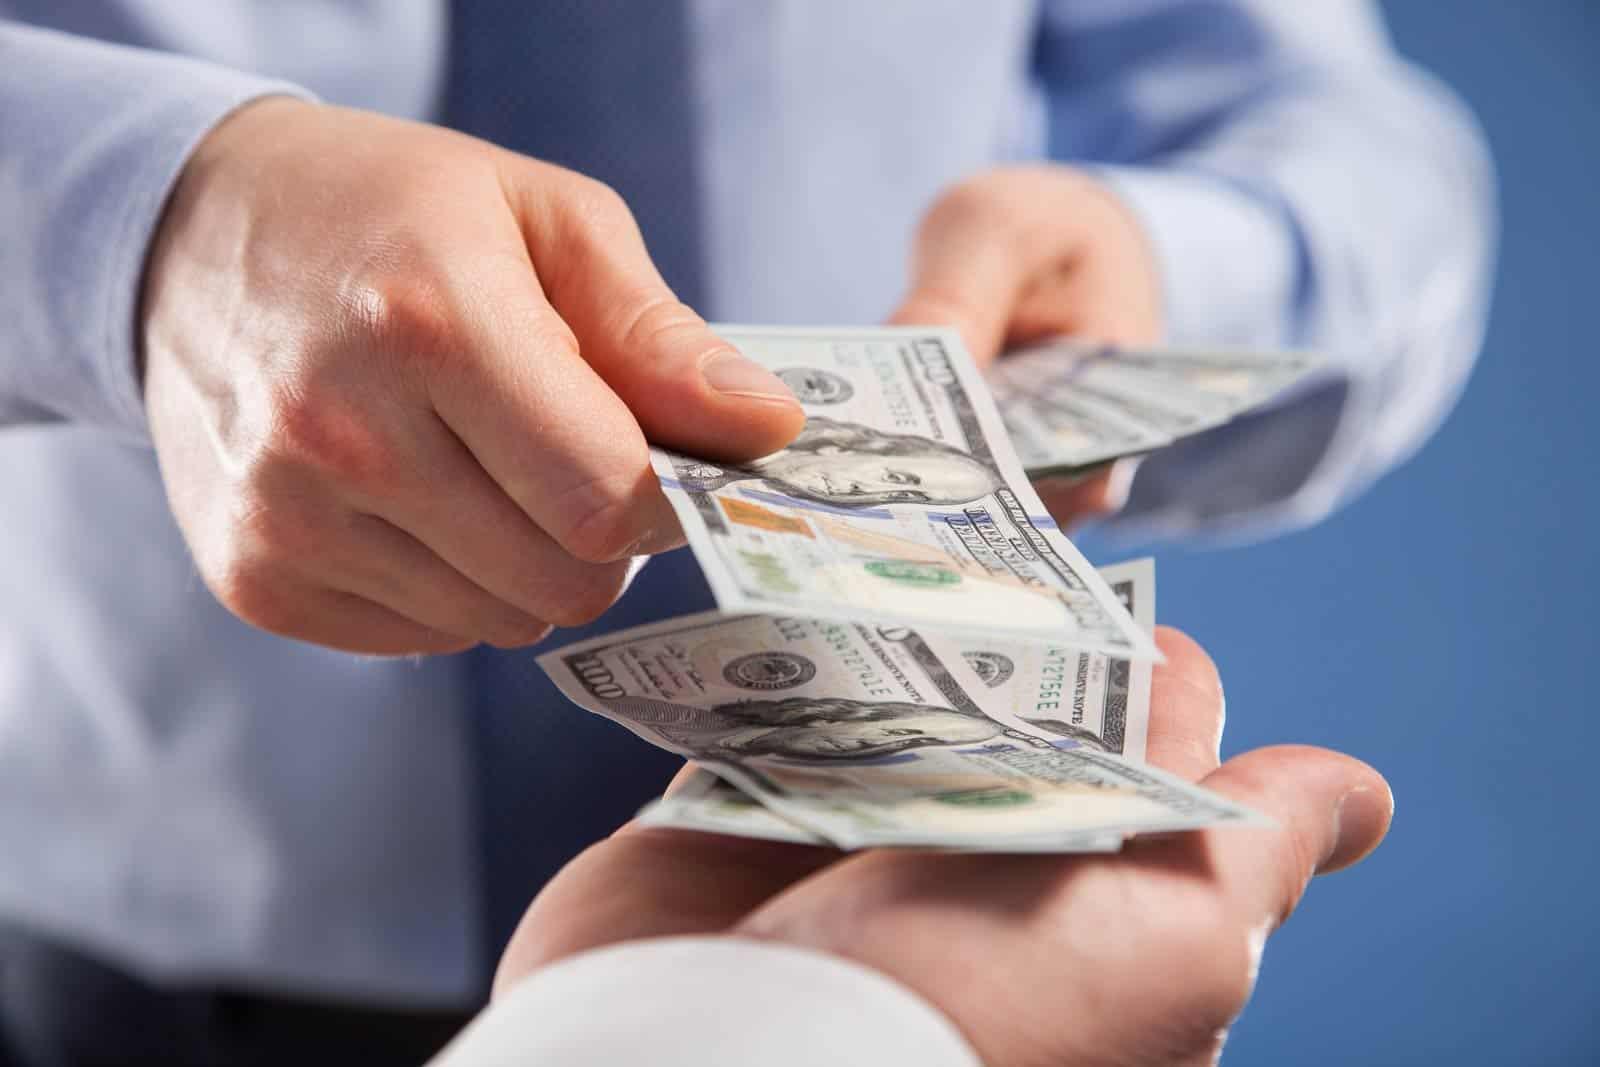 бърз кредит онлайн без трудов договор